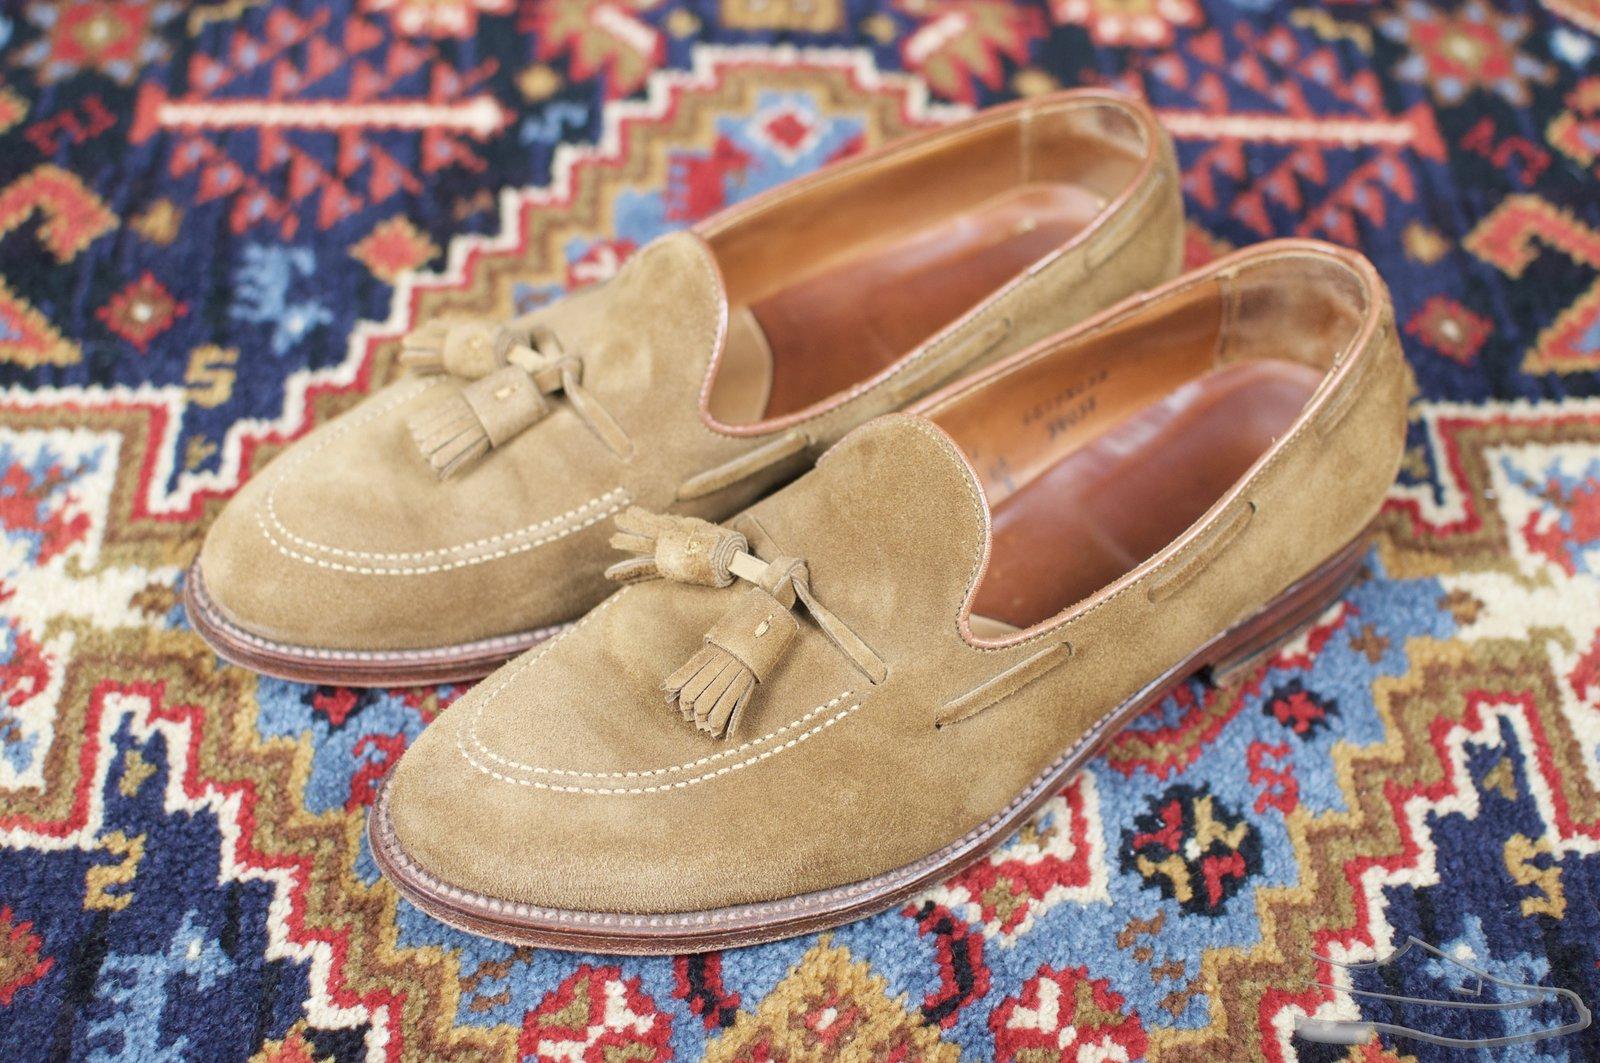 Alden Snuff Suede Tassel Loafers - 2020-09-19 - 1.jpg